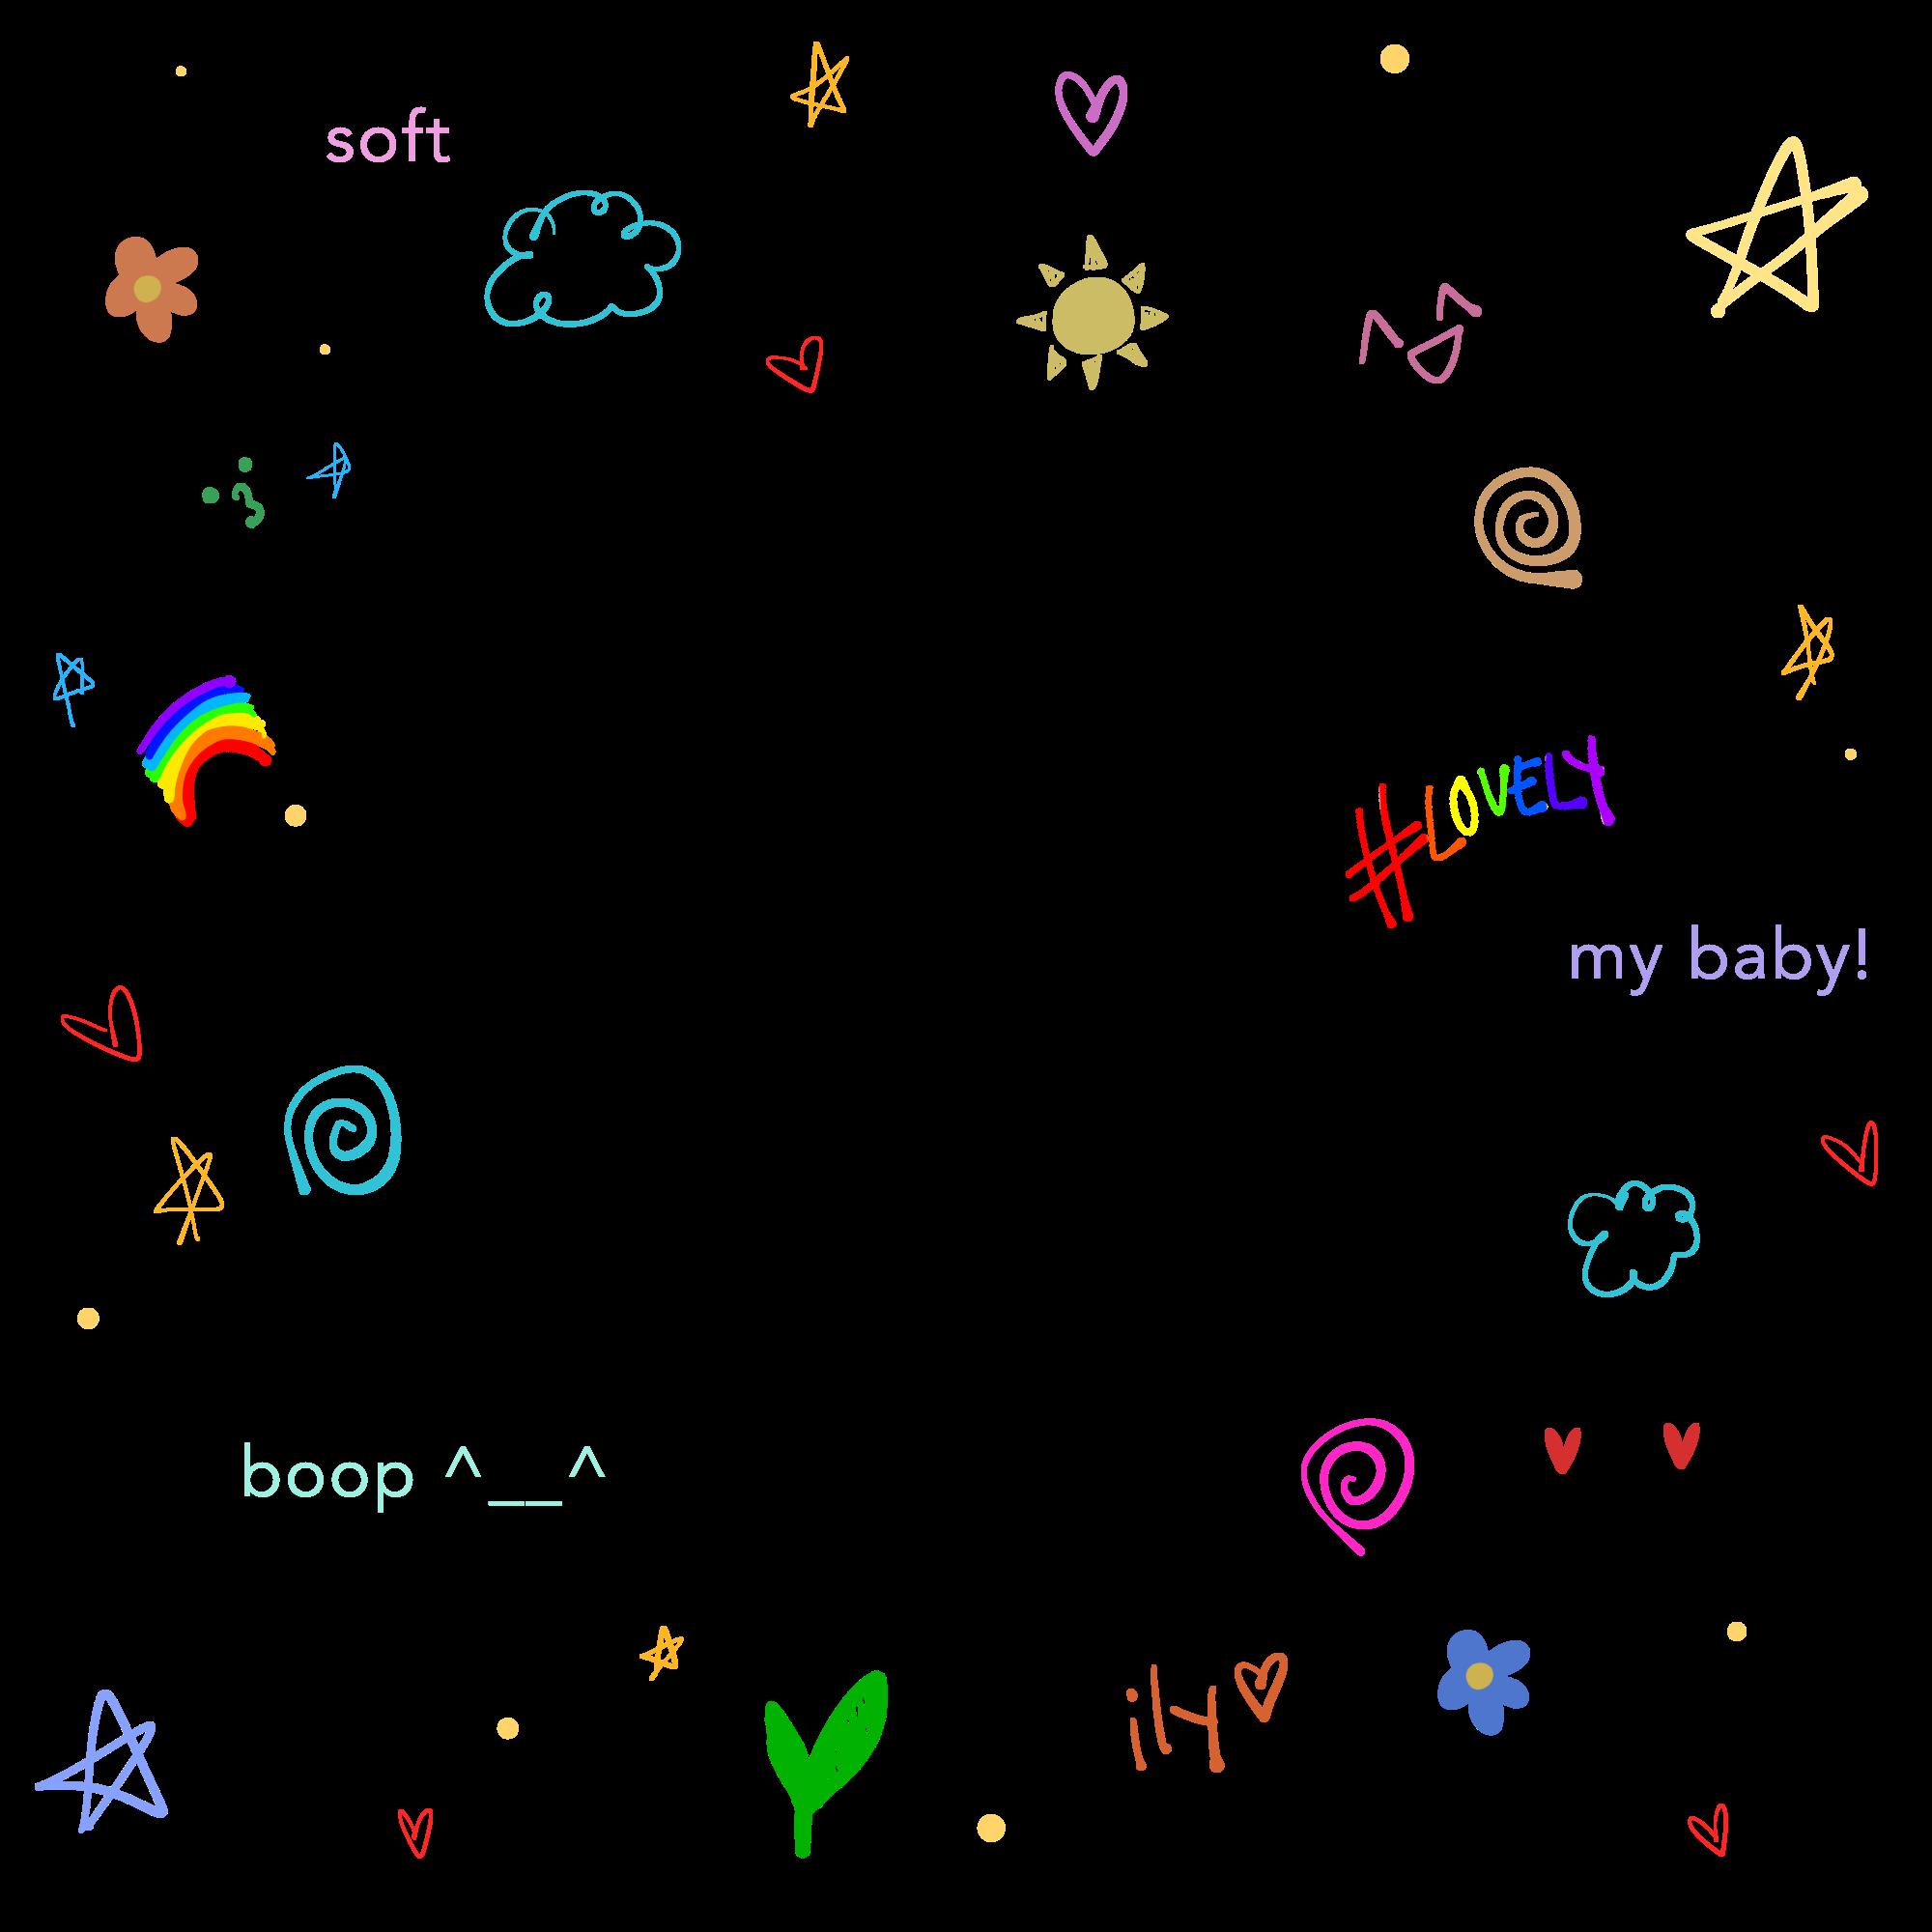 Soft Aesthetic Cute Softedit Edit Kawaii Kpop Border Messy Cyber Doodle Frame Freetoedit Remixit Di 2020 Ilustrasi Poster Kreatif Pengeditan Foto